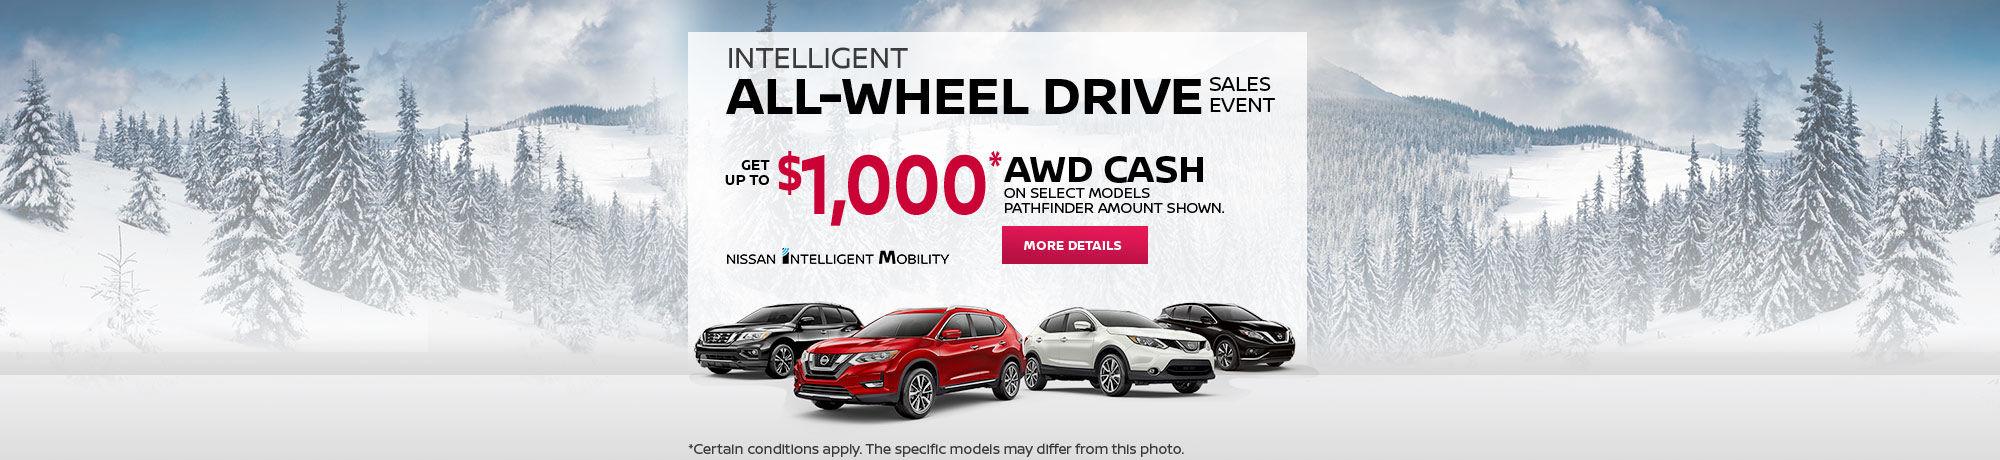 Nissan Intelligent All-Wheel Drive Sales Event!